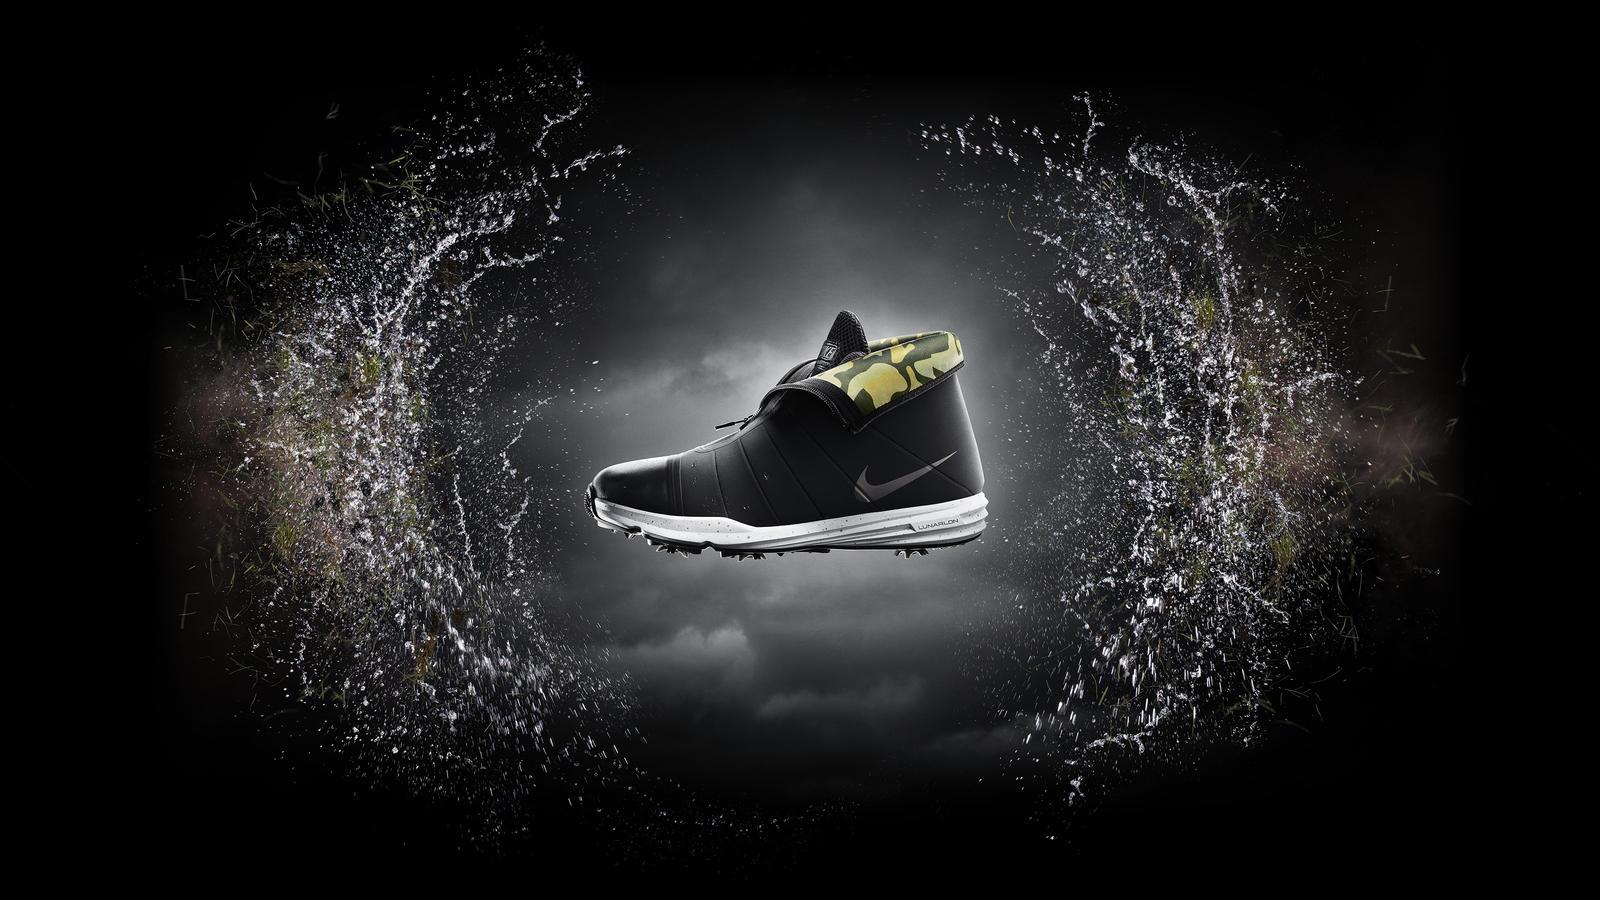 Nike Lunar Bandon 3: All-Conditions